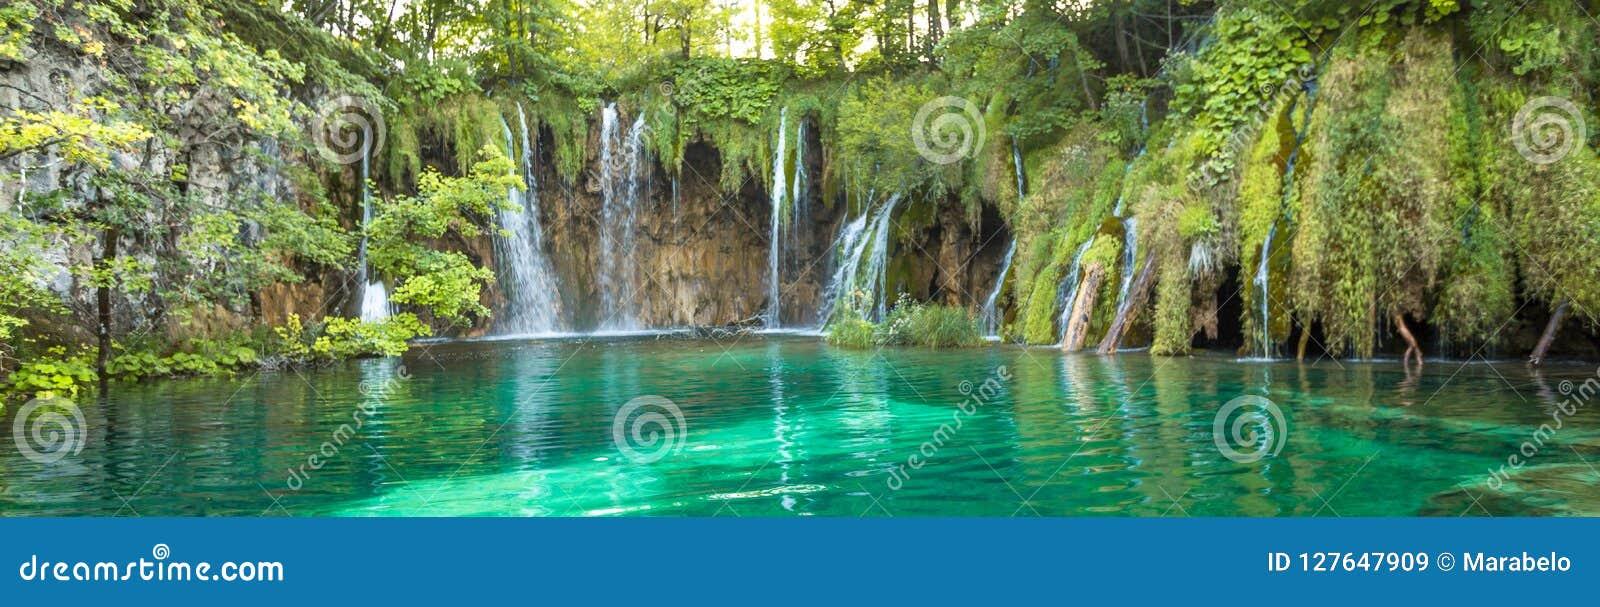 Plitvice Lakes, Croatia Waterfall. Amazing Place.